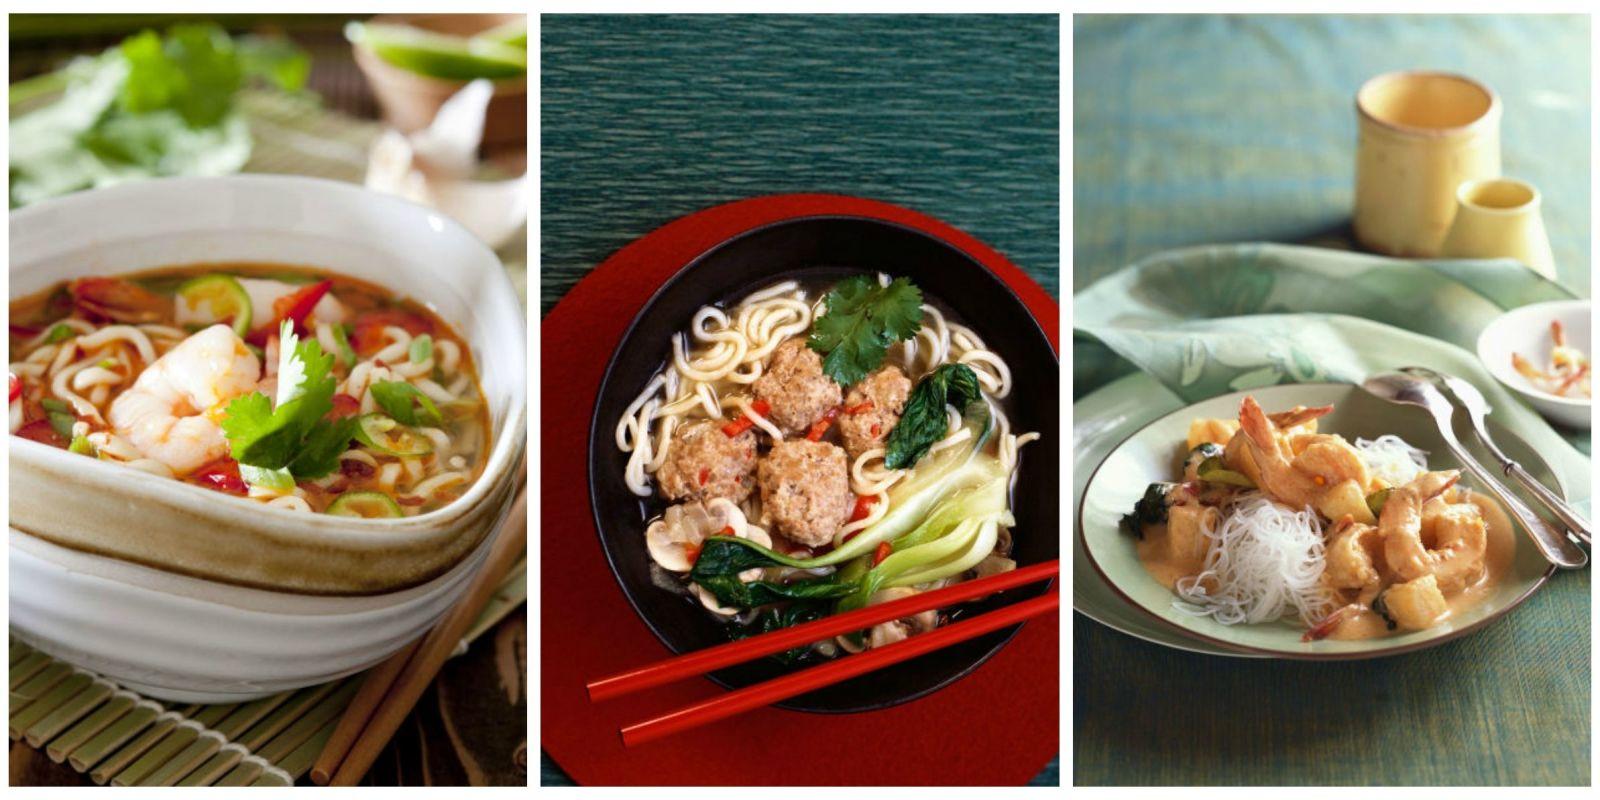 20 easy ramen noodle recipes best recipes with ramen noodles for Unique meals